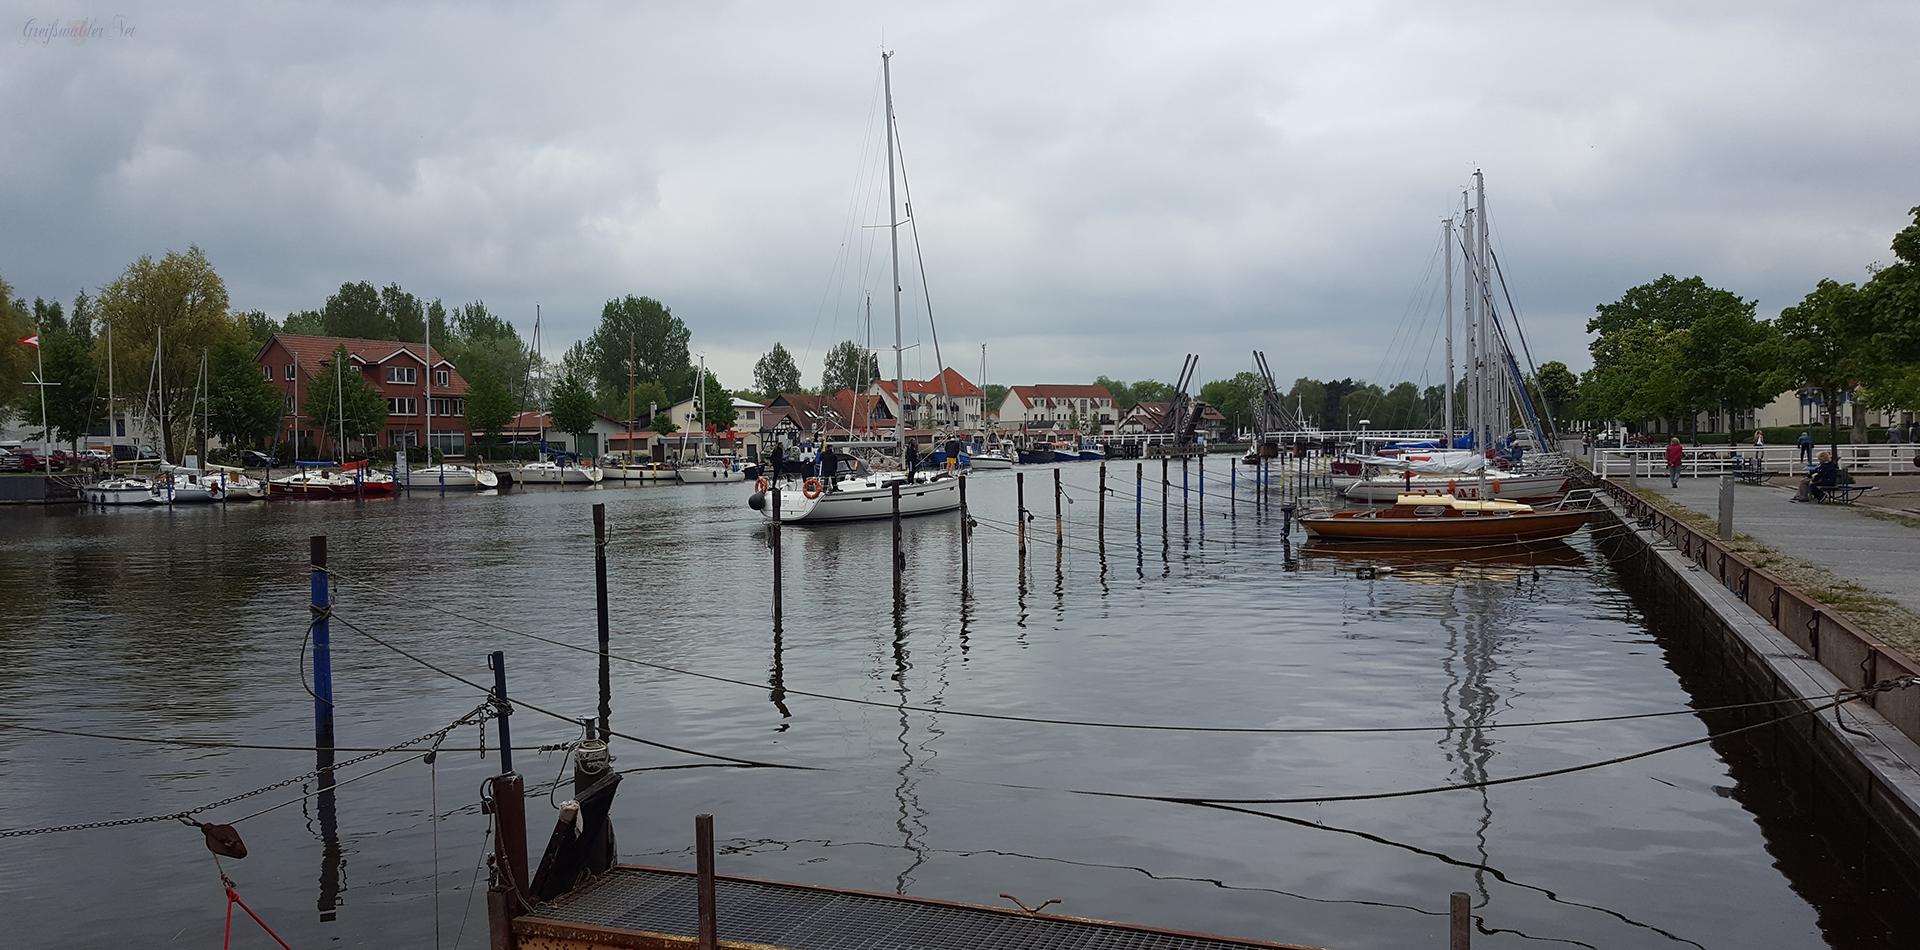 Freitagnachmittag in Greifswald-Wieck